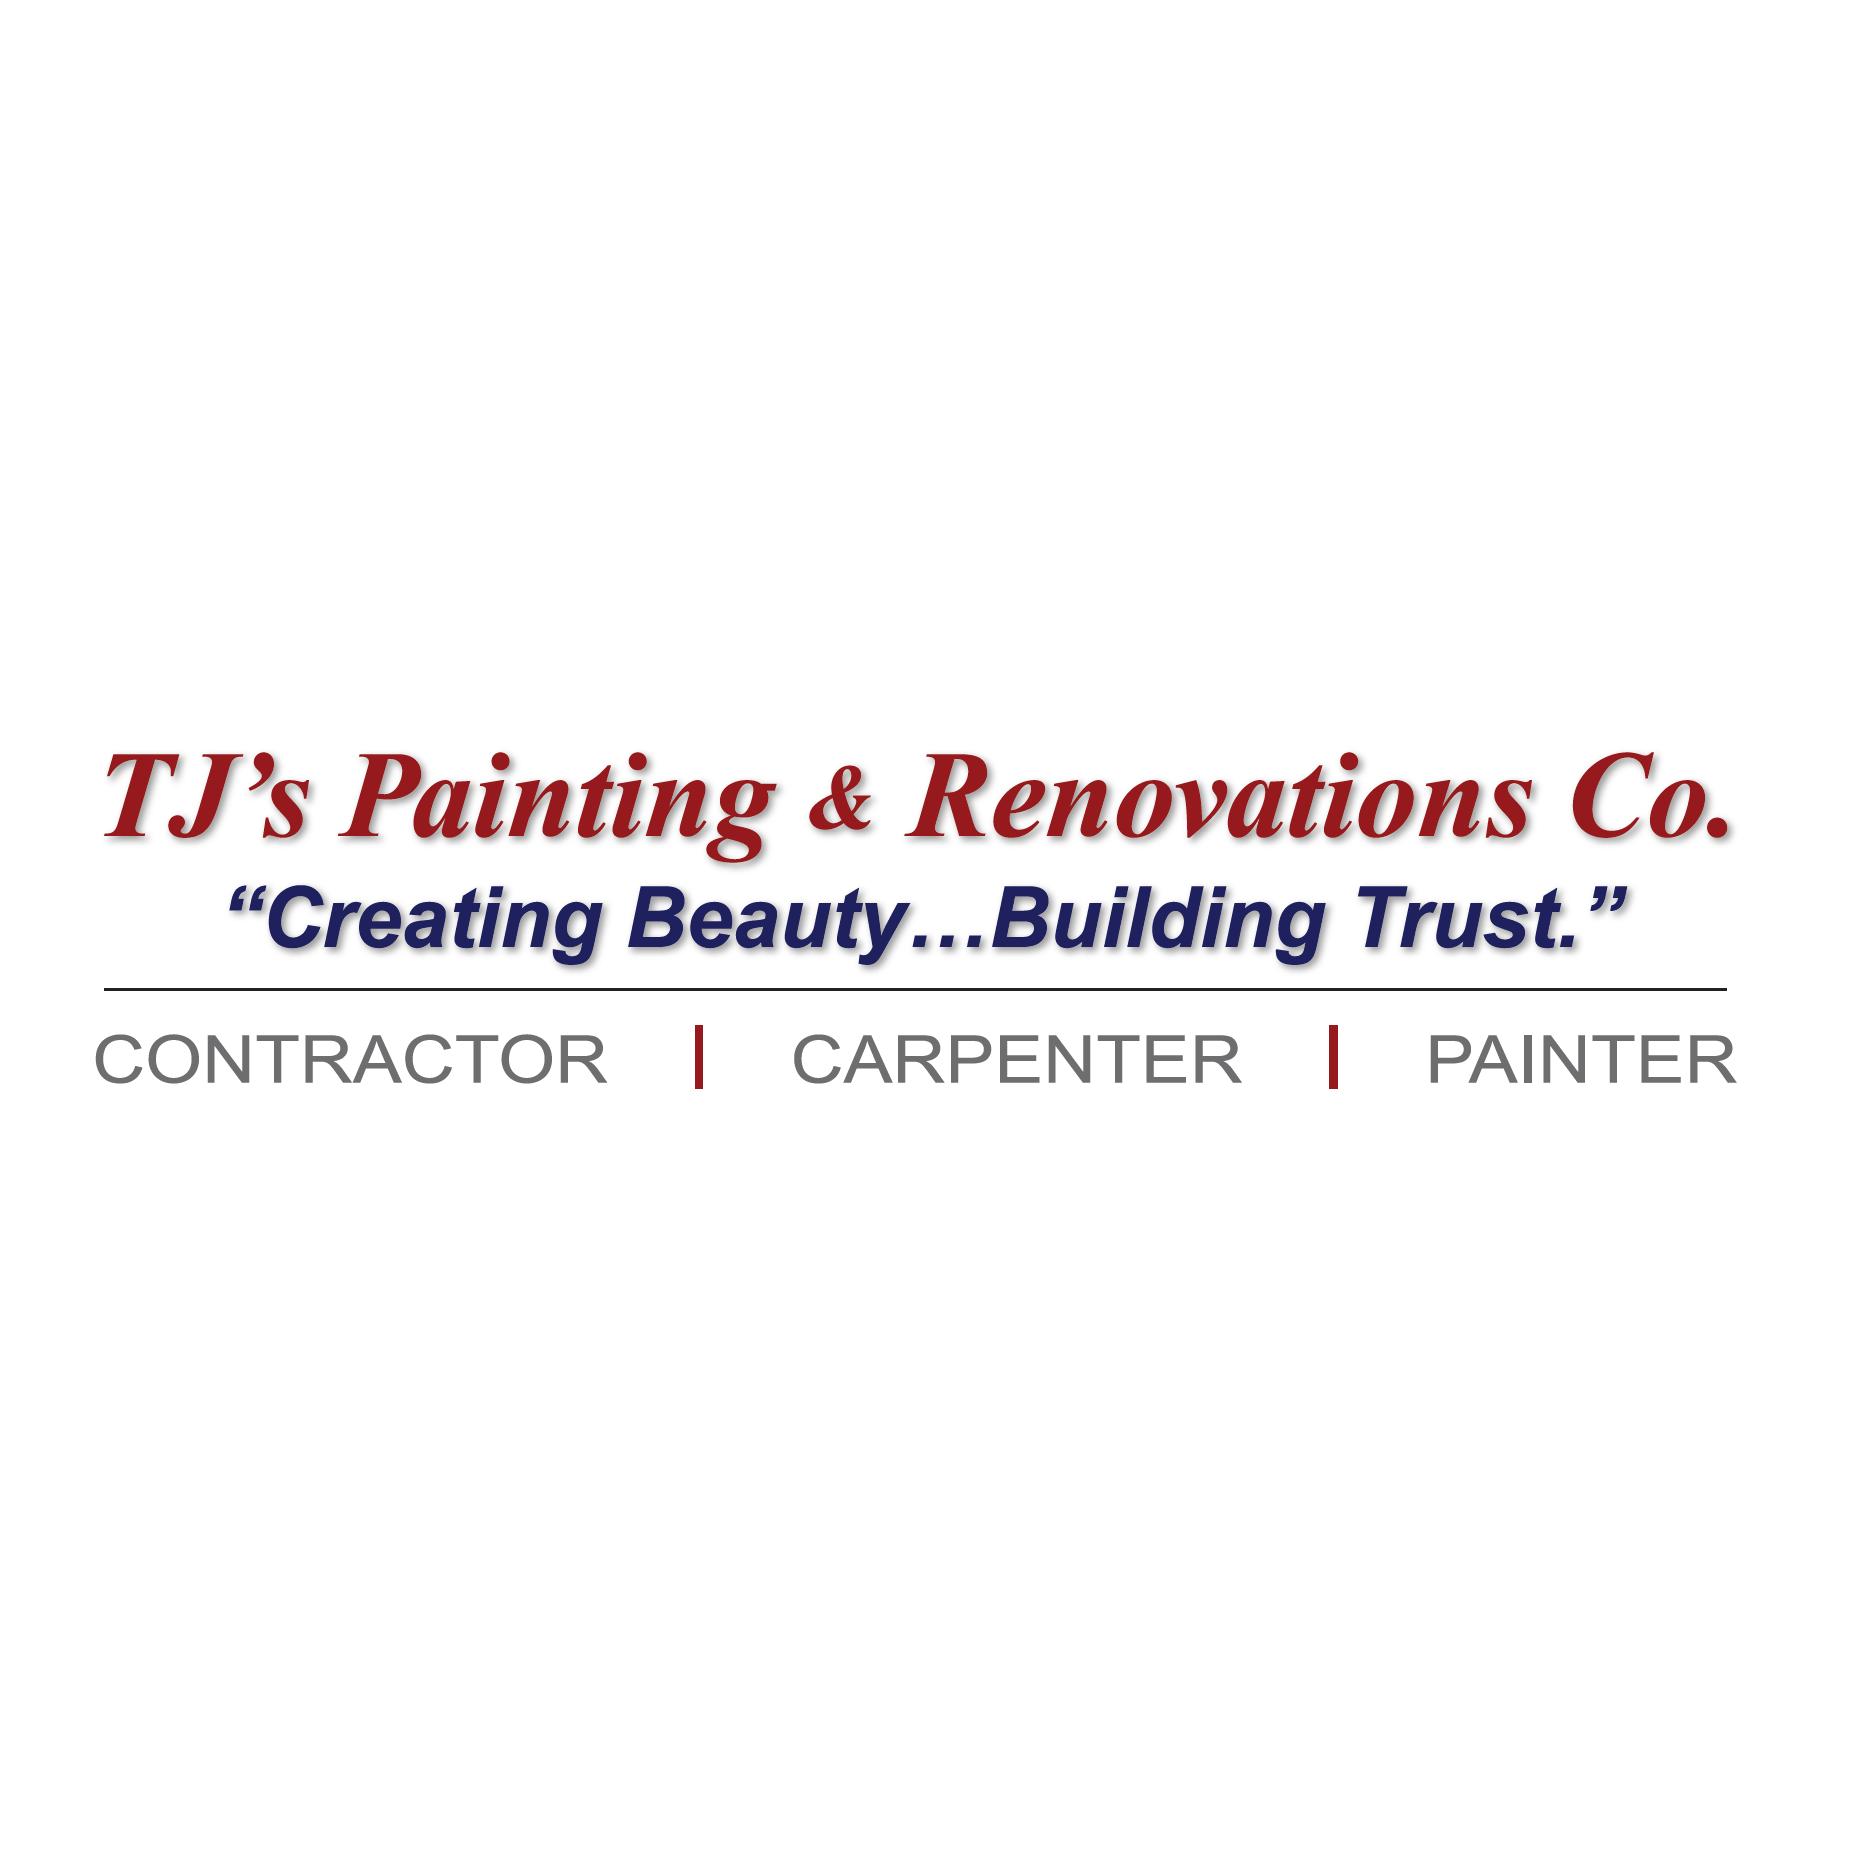 T.J.'s Painting & Renovations Co. Logo